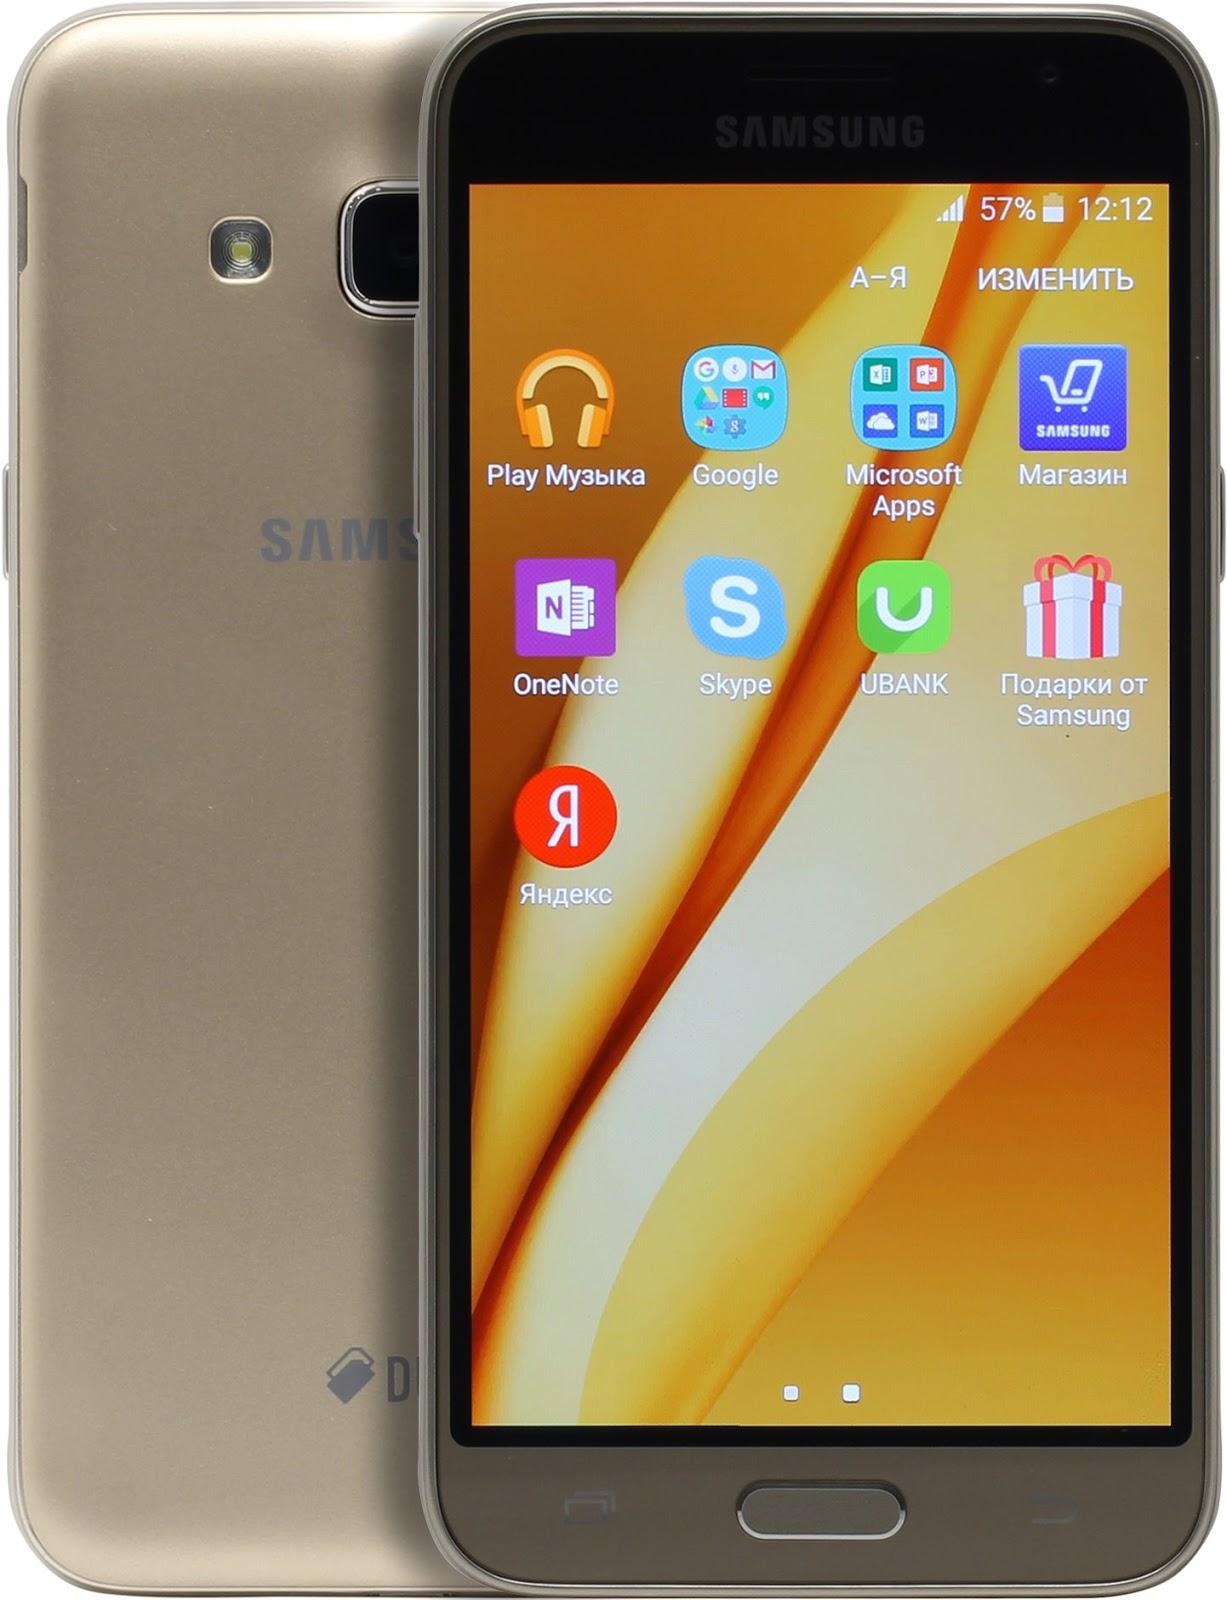 Samsung J3(2016) SM-J320F Root File 200% Work No Problem Done File